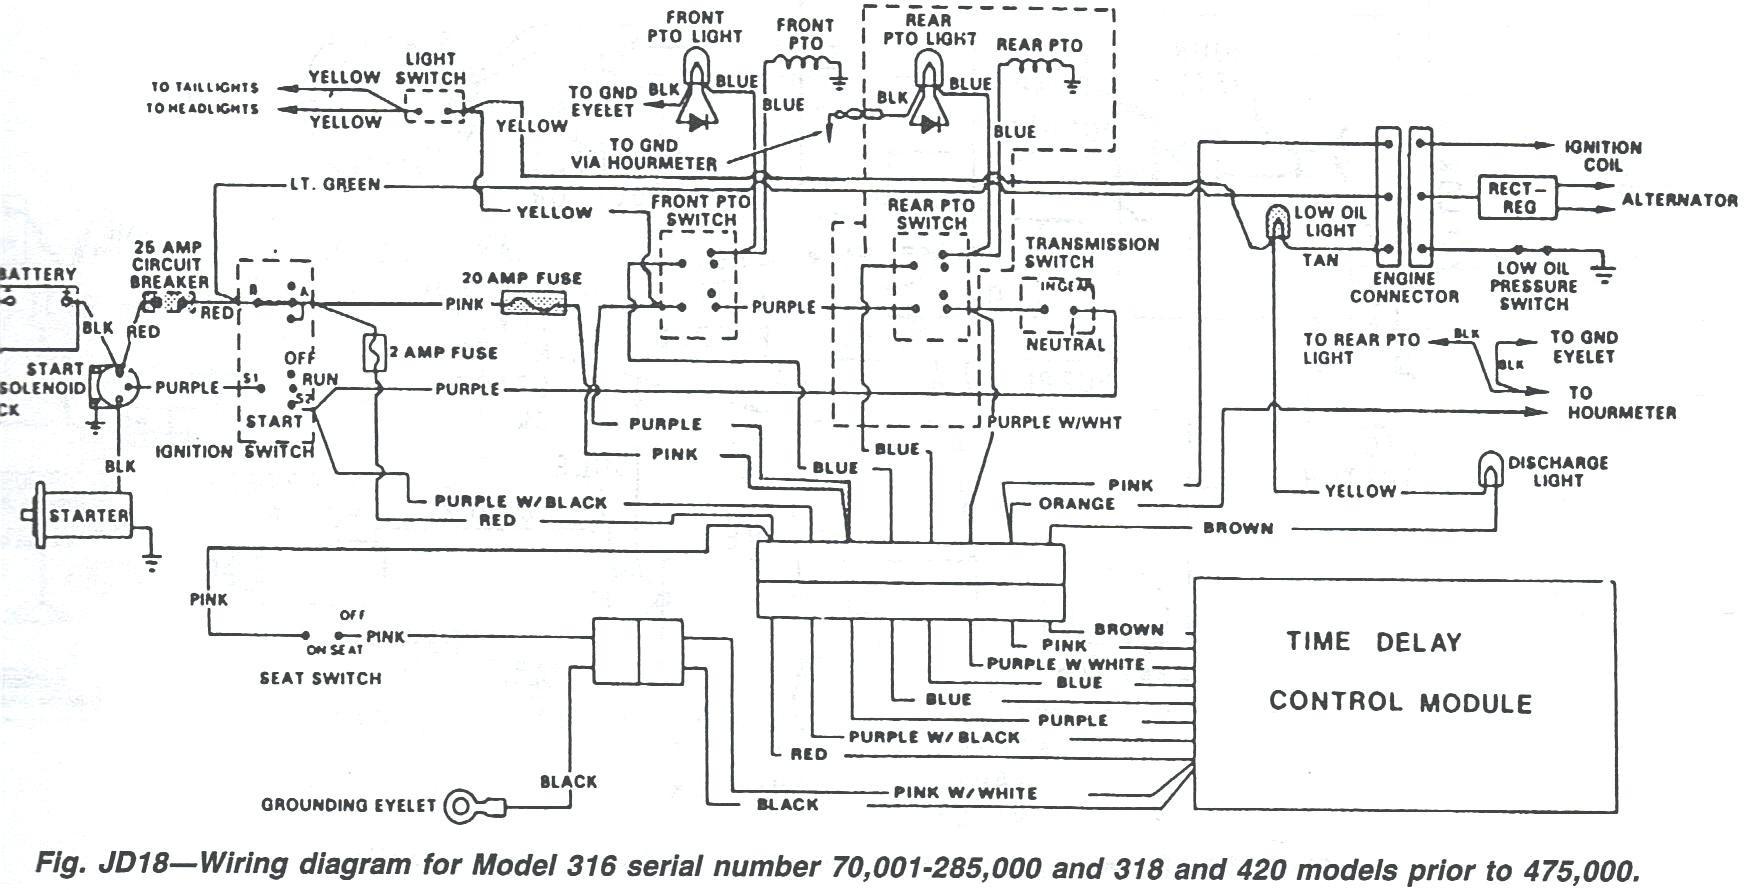 Wiring Diagram For John Deere 4020 - Wiring Diagram 500 on john deere 110 wiring diagram, john deere wiring harness diagram, john deere lt160 drive belt diagram,